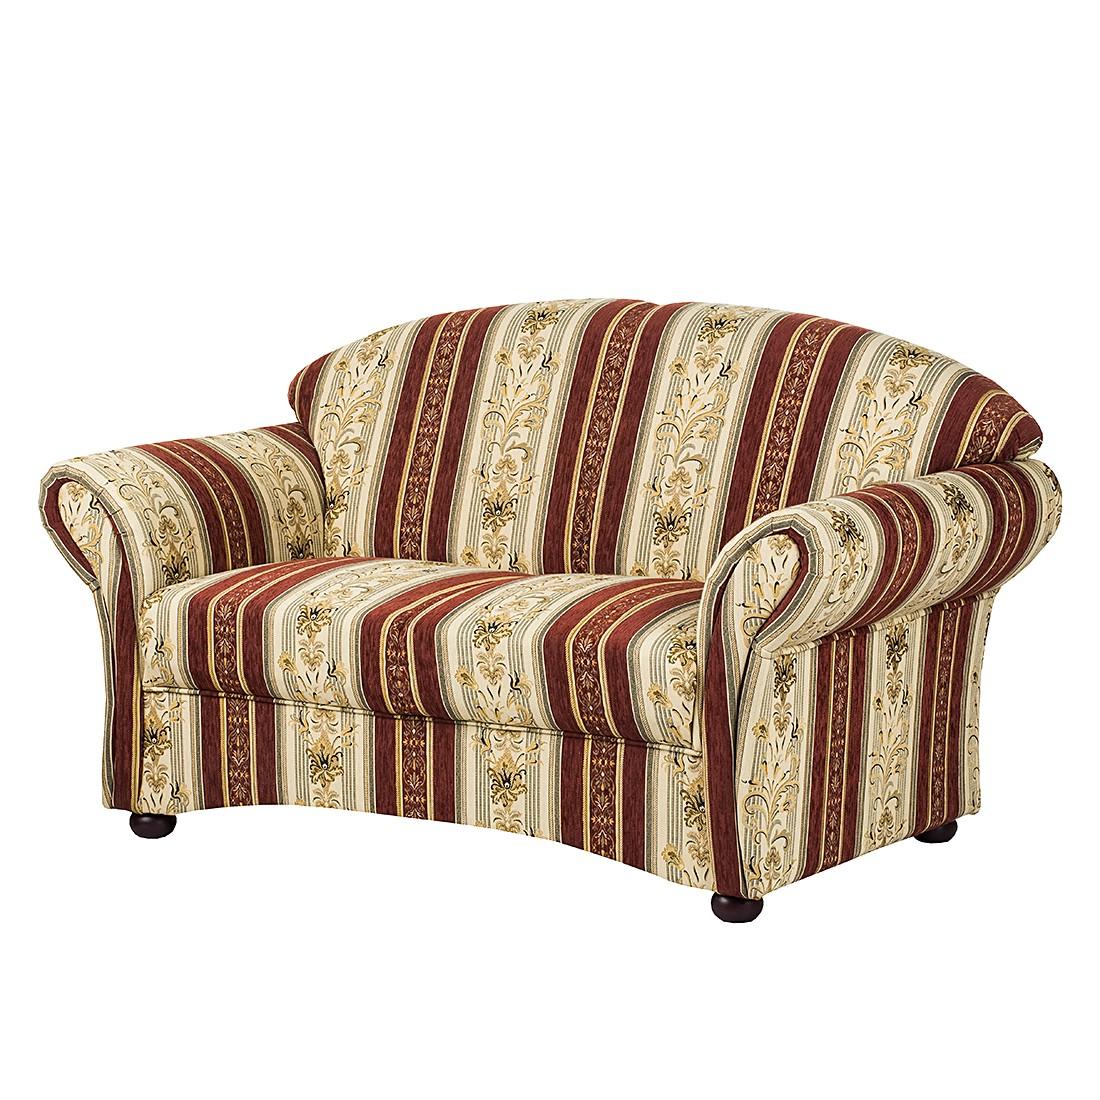 Sofa Henry (2-Sitzer) – Webstoff Beige/Bordeaux, Maison Belfort günstig